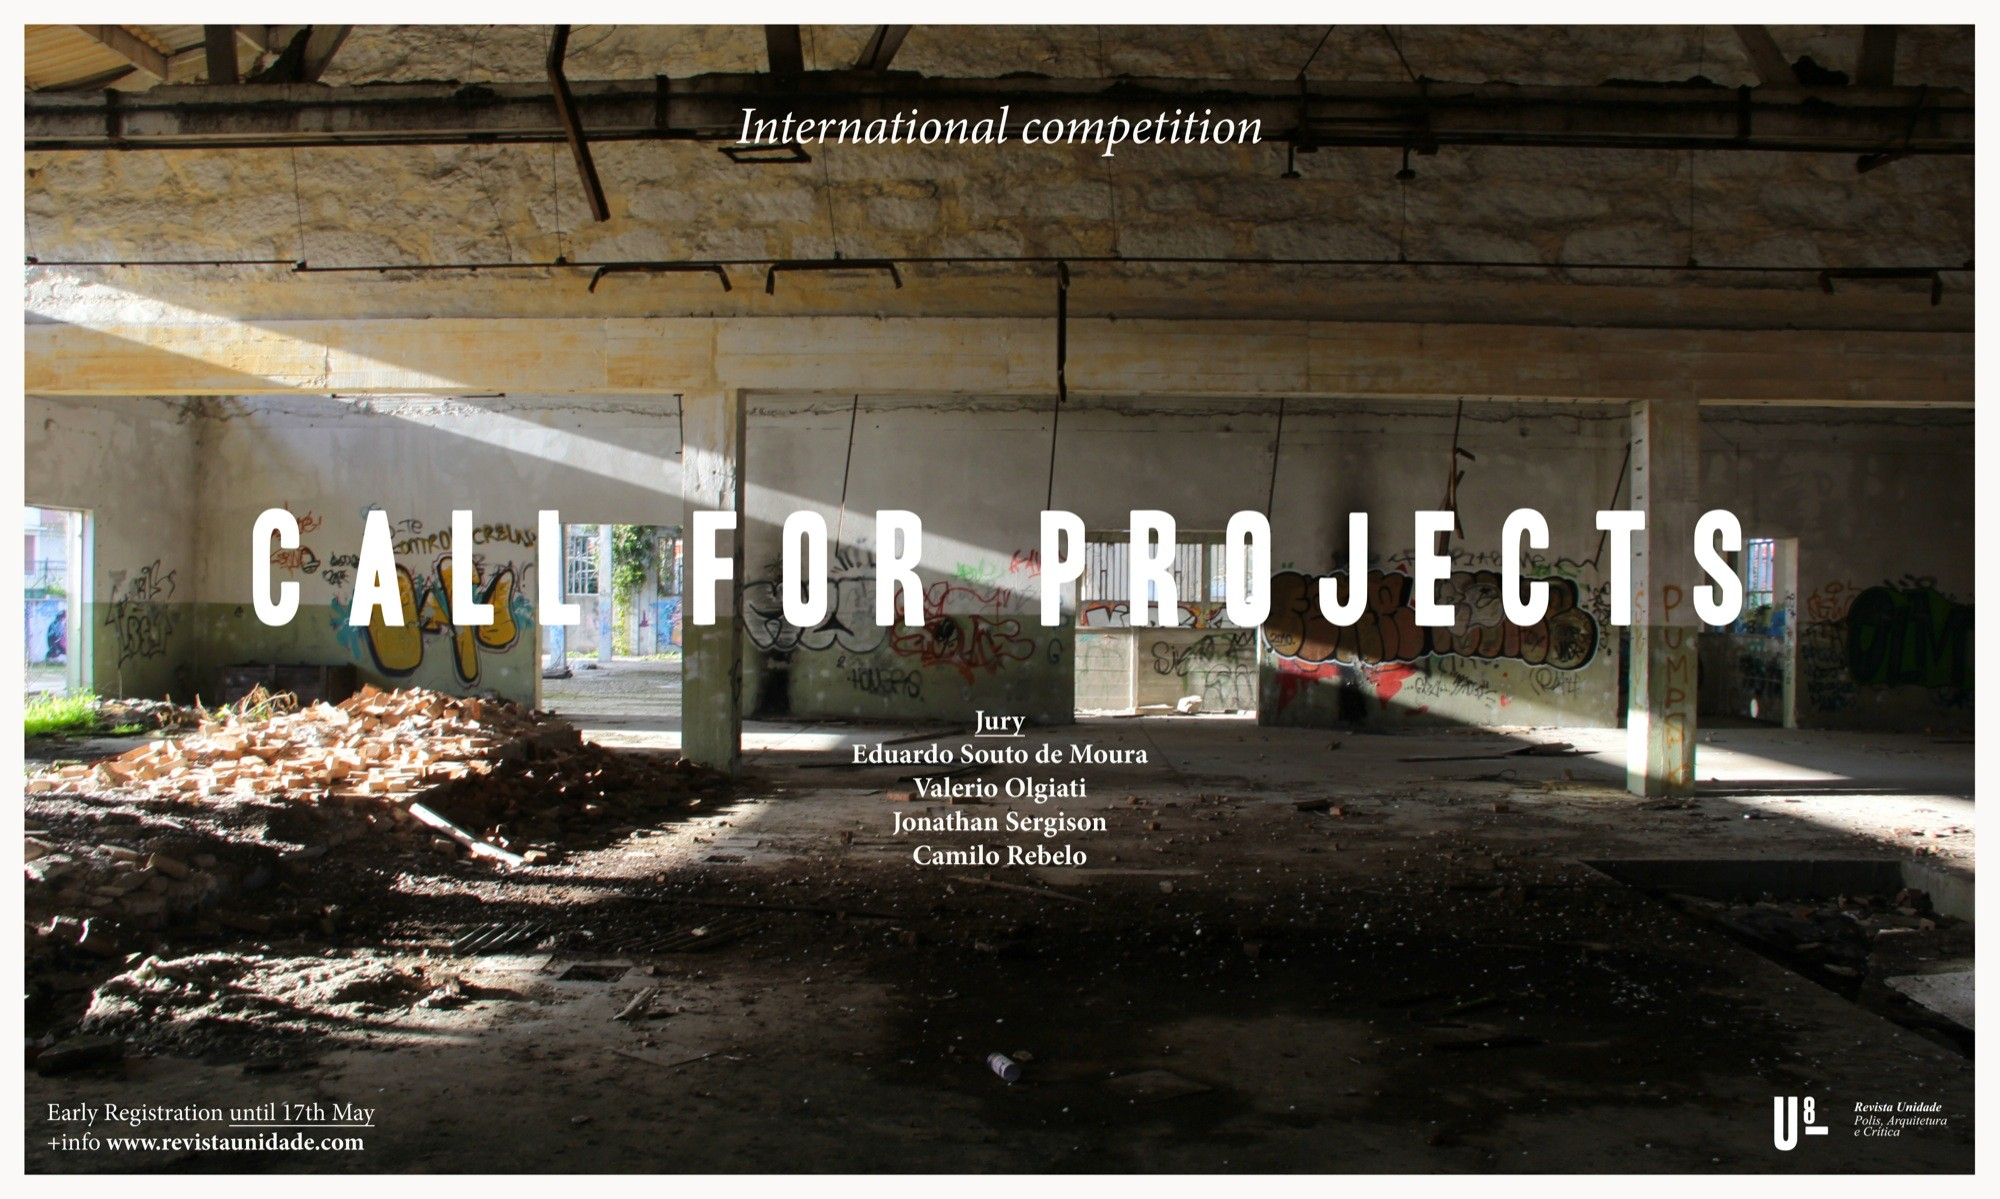 U8 International Competition: The Unknown Porto